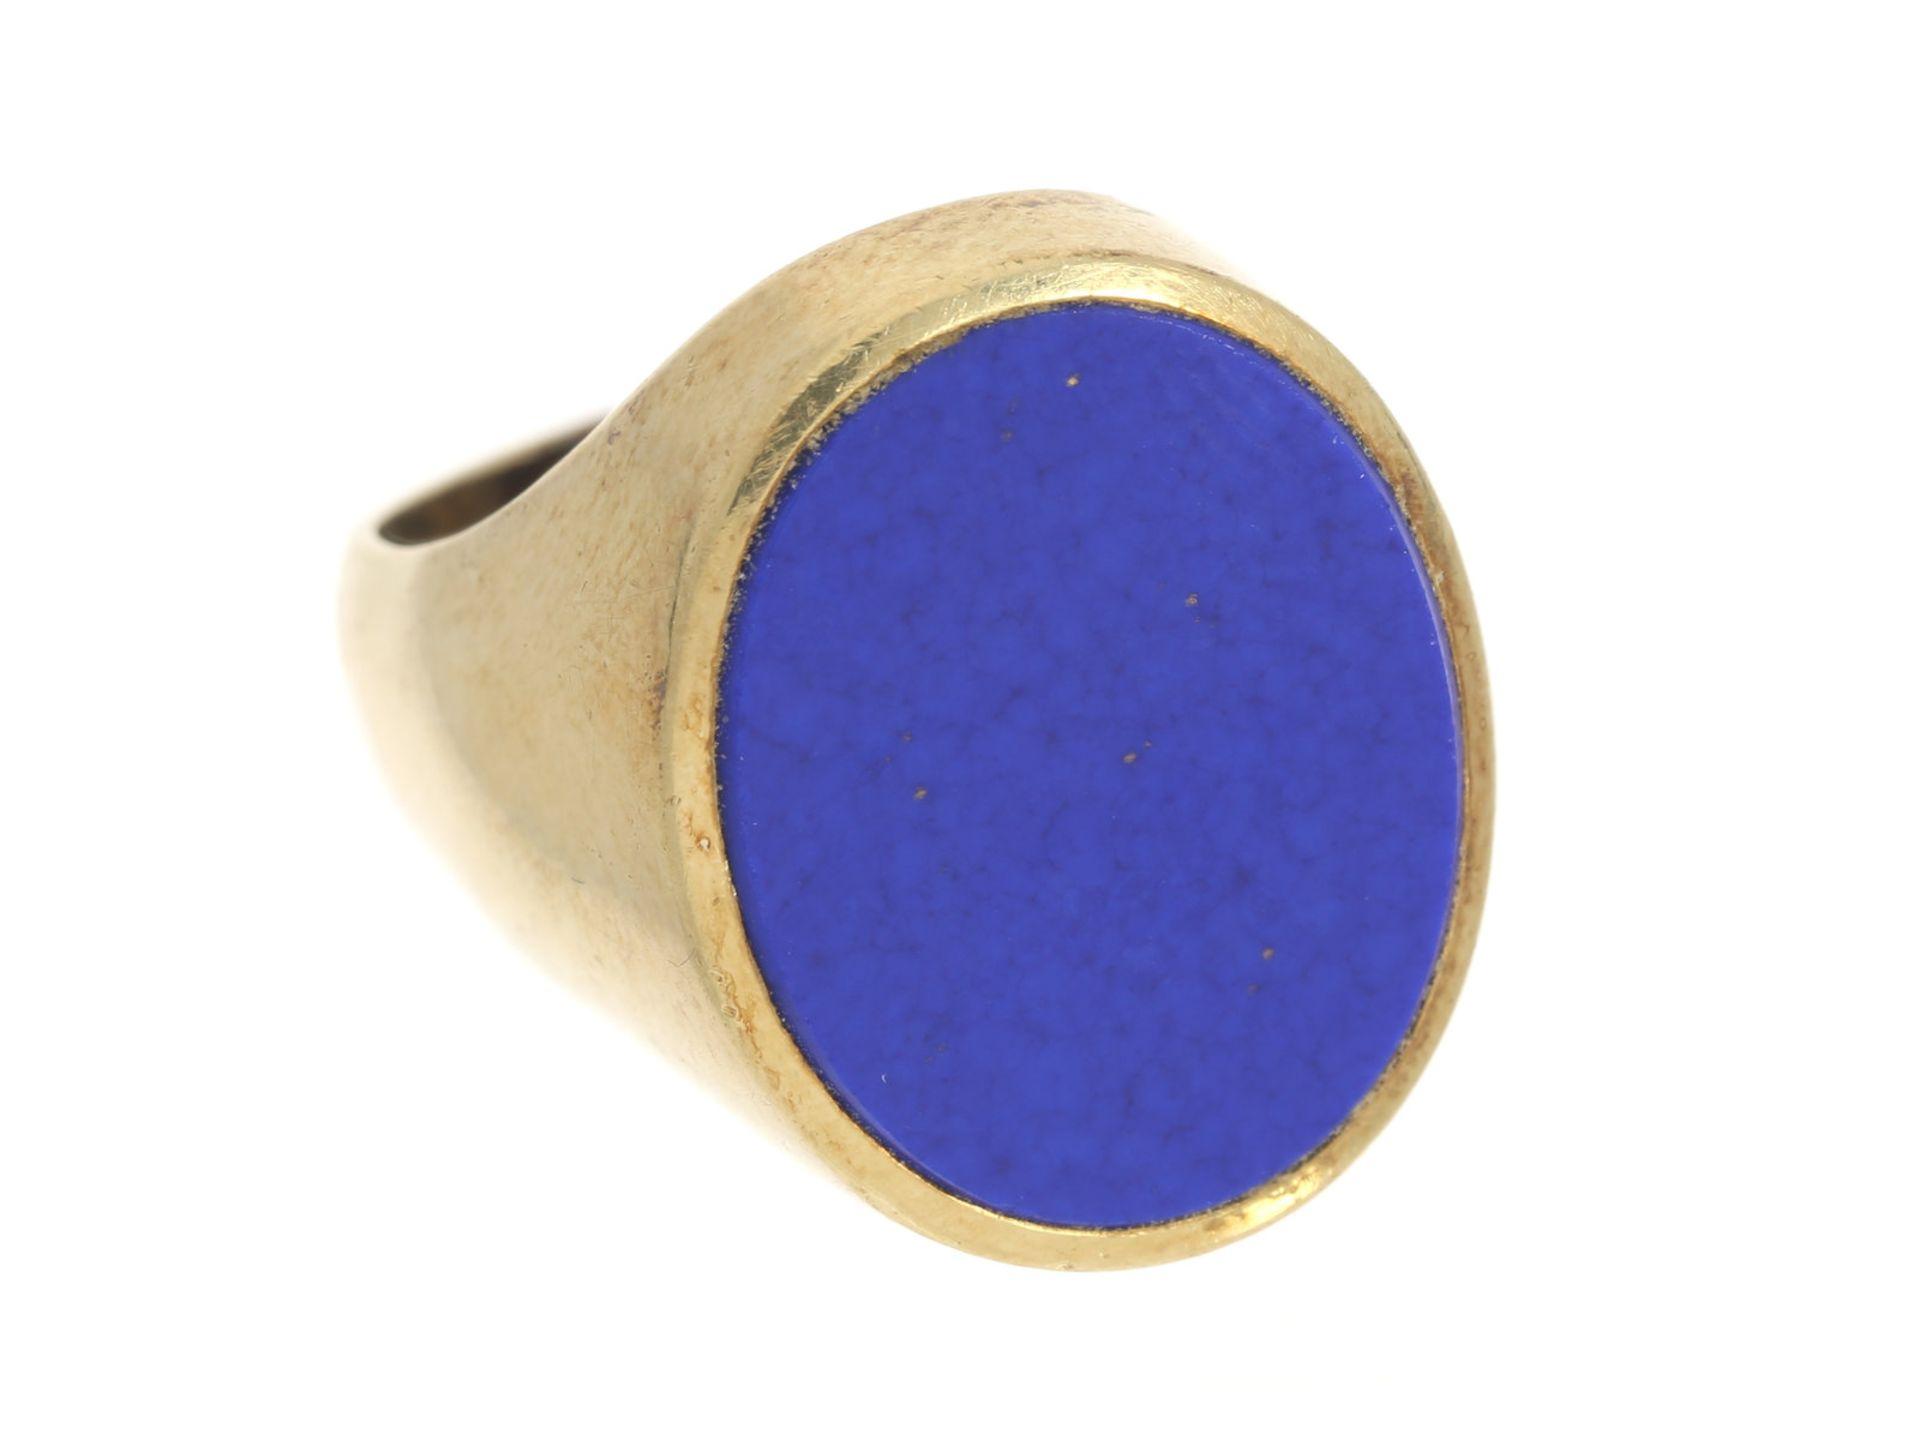 Ring: massiver vintage Siegelring mit Lapislazuli, 14K Gold Ca. Ø17,5mm, RG55, ca. 12,1g, 14K Gold,